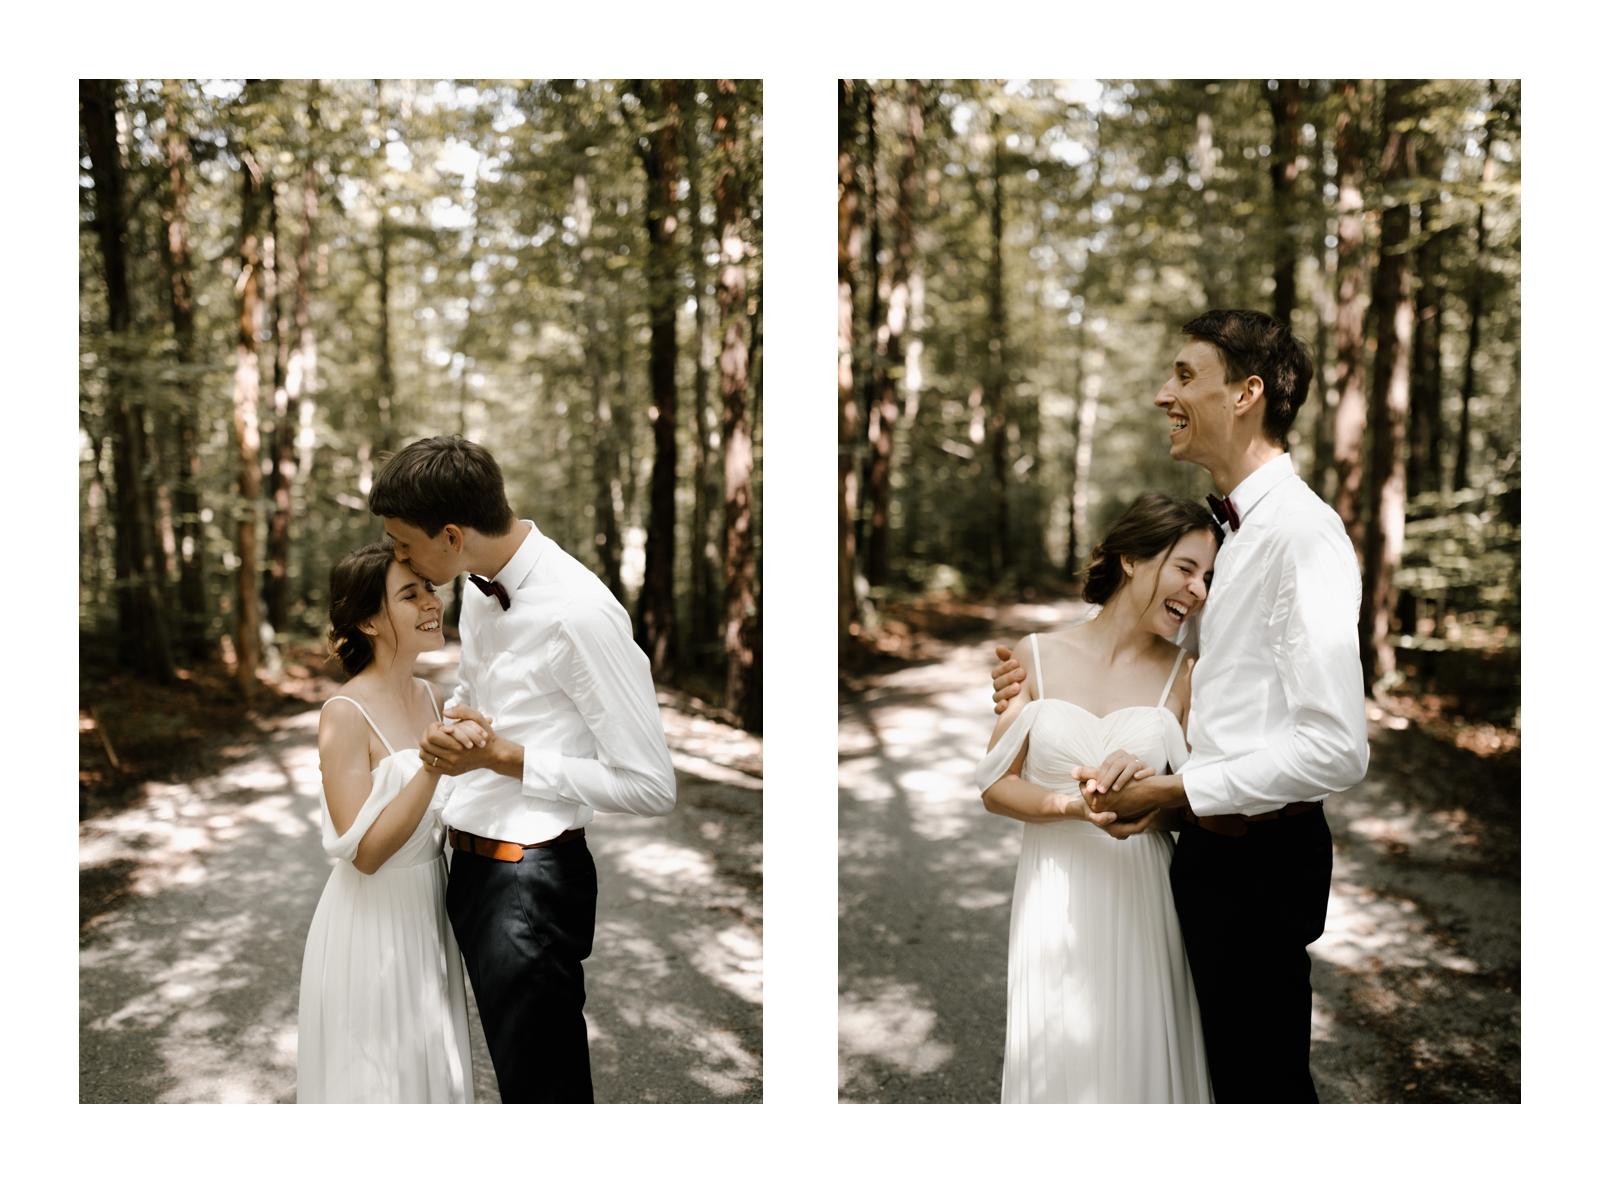 mirjam_thomas_wedding-229.jpg